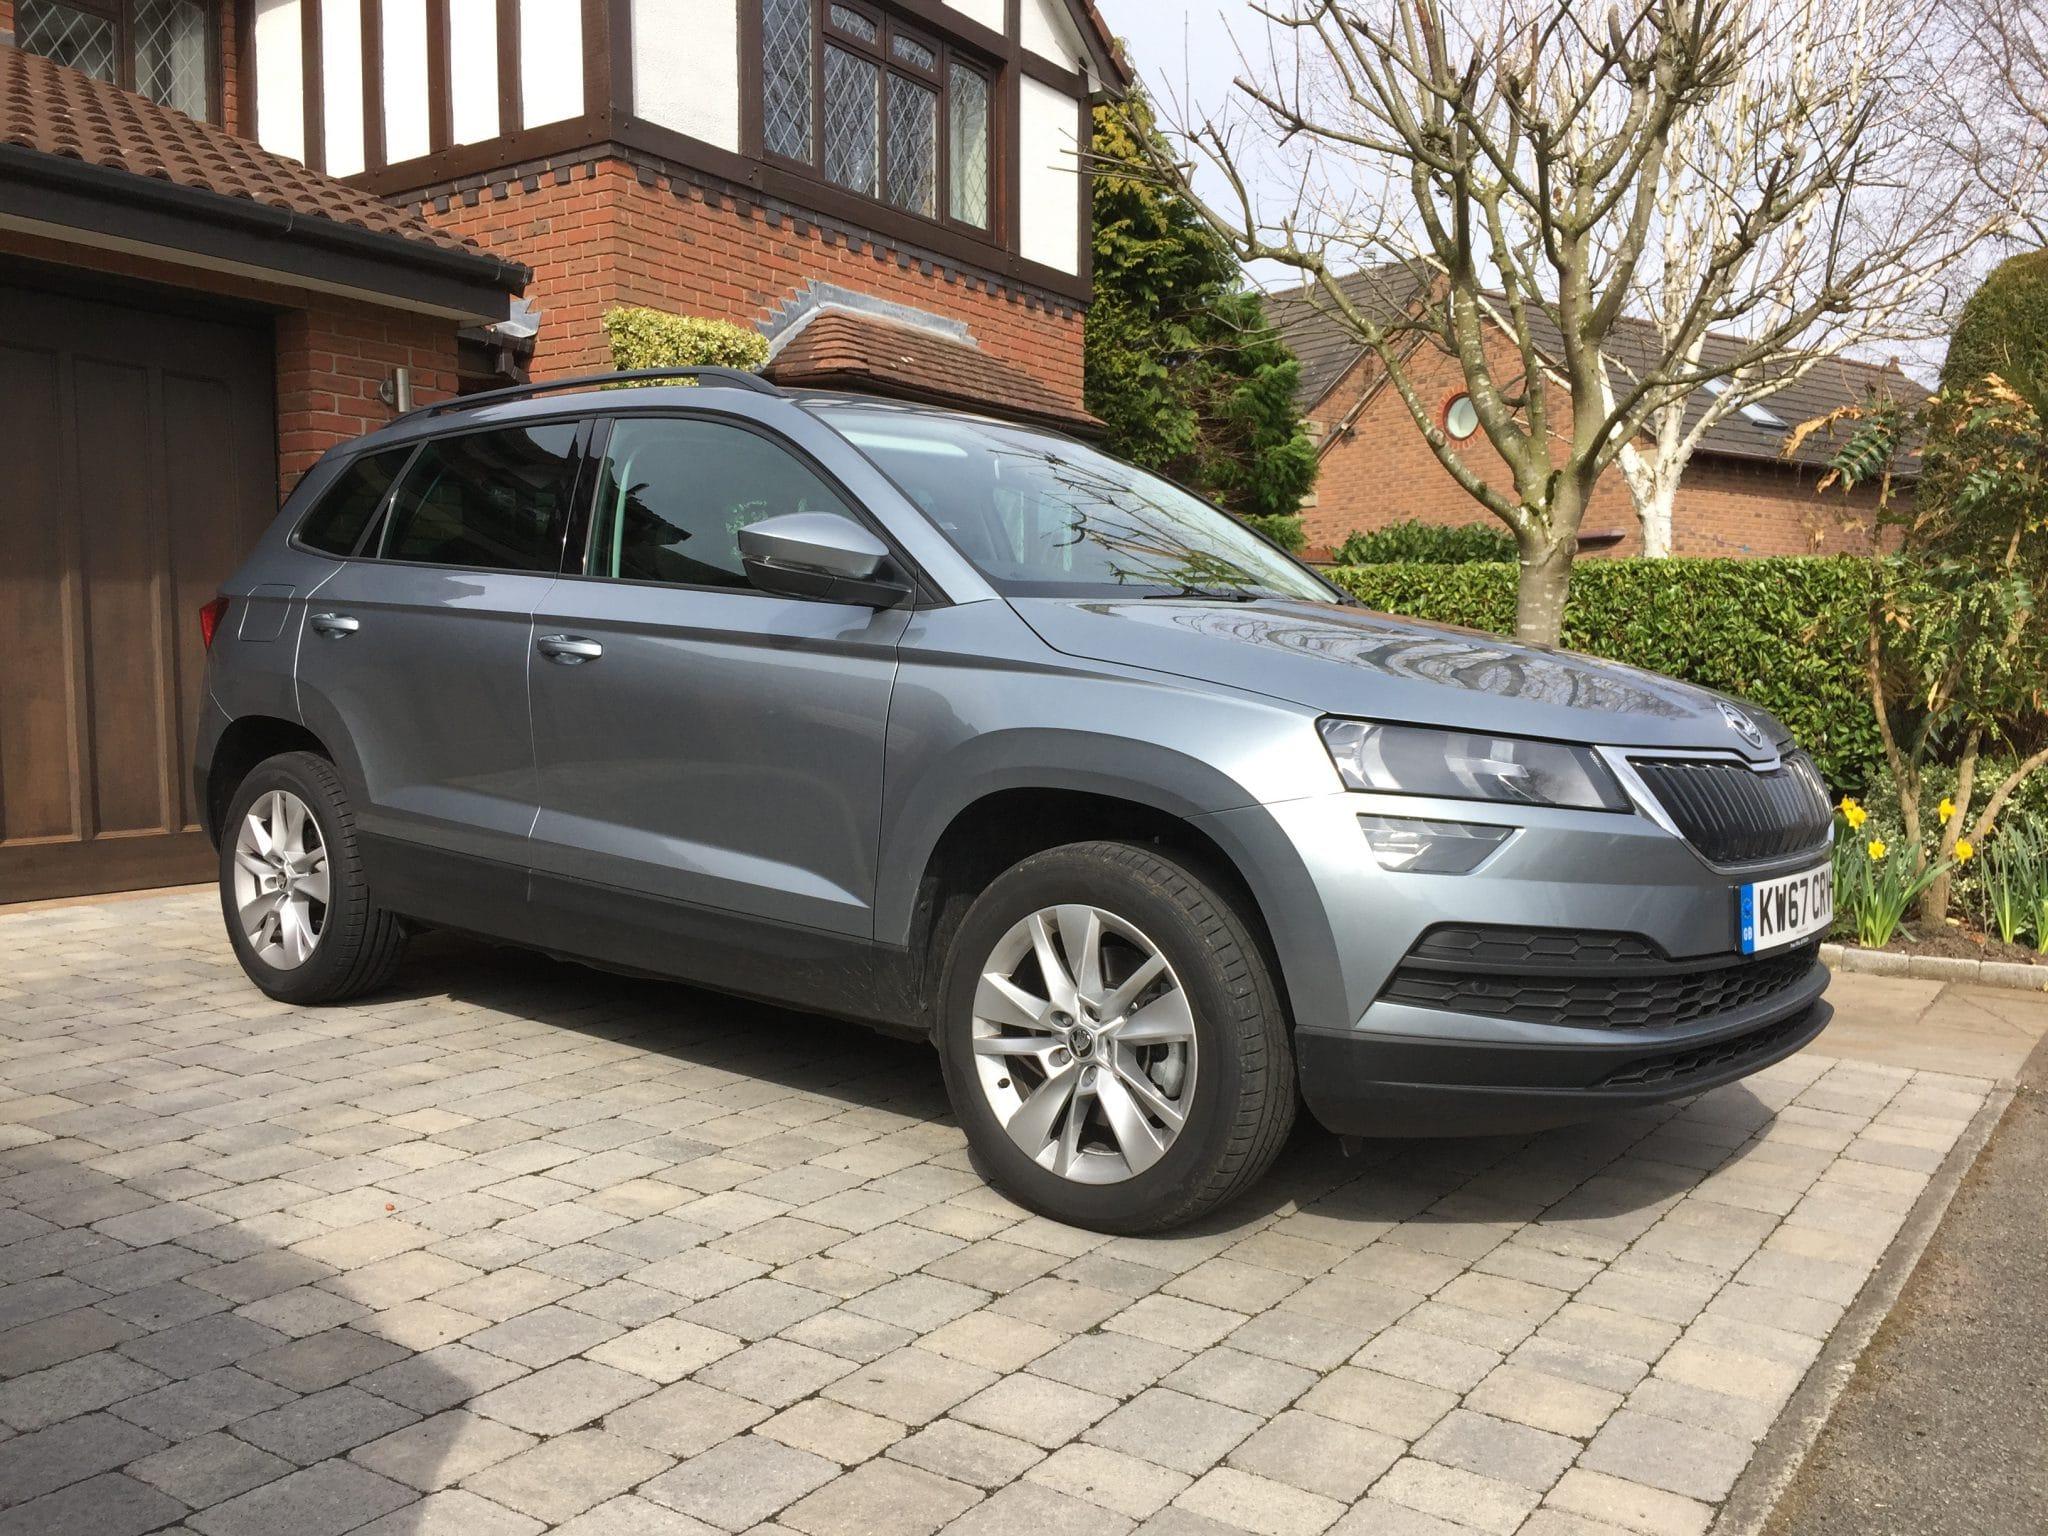 SKODA Karoq : Company Car and Van